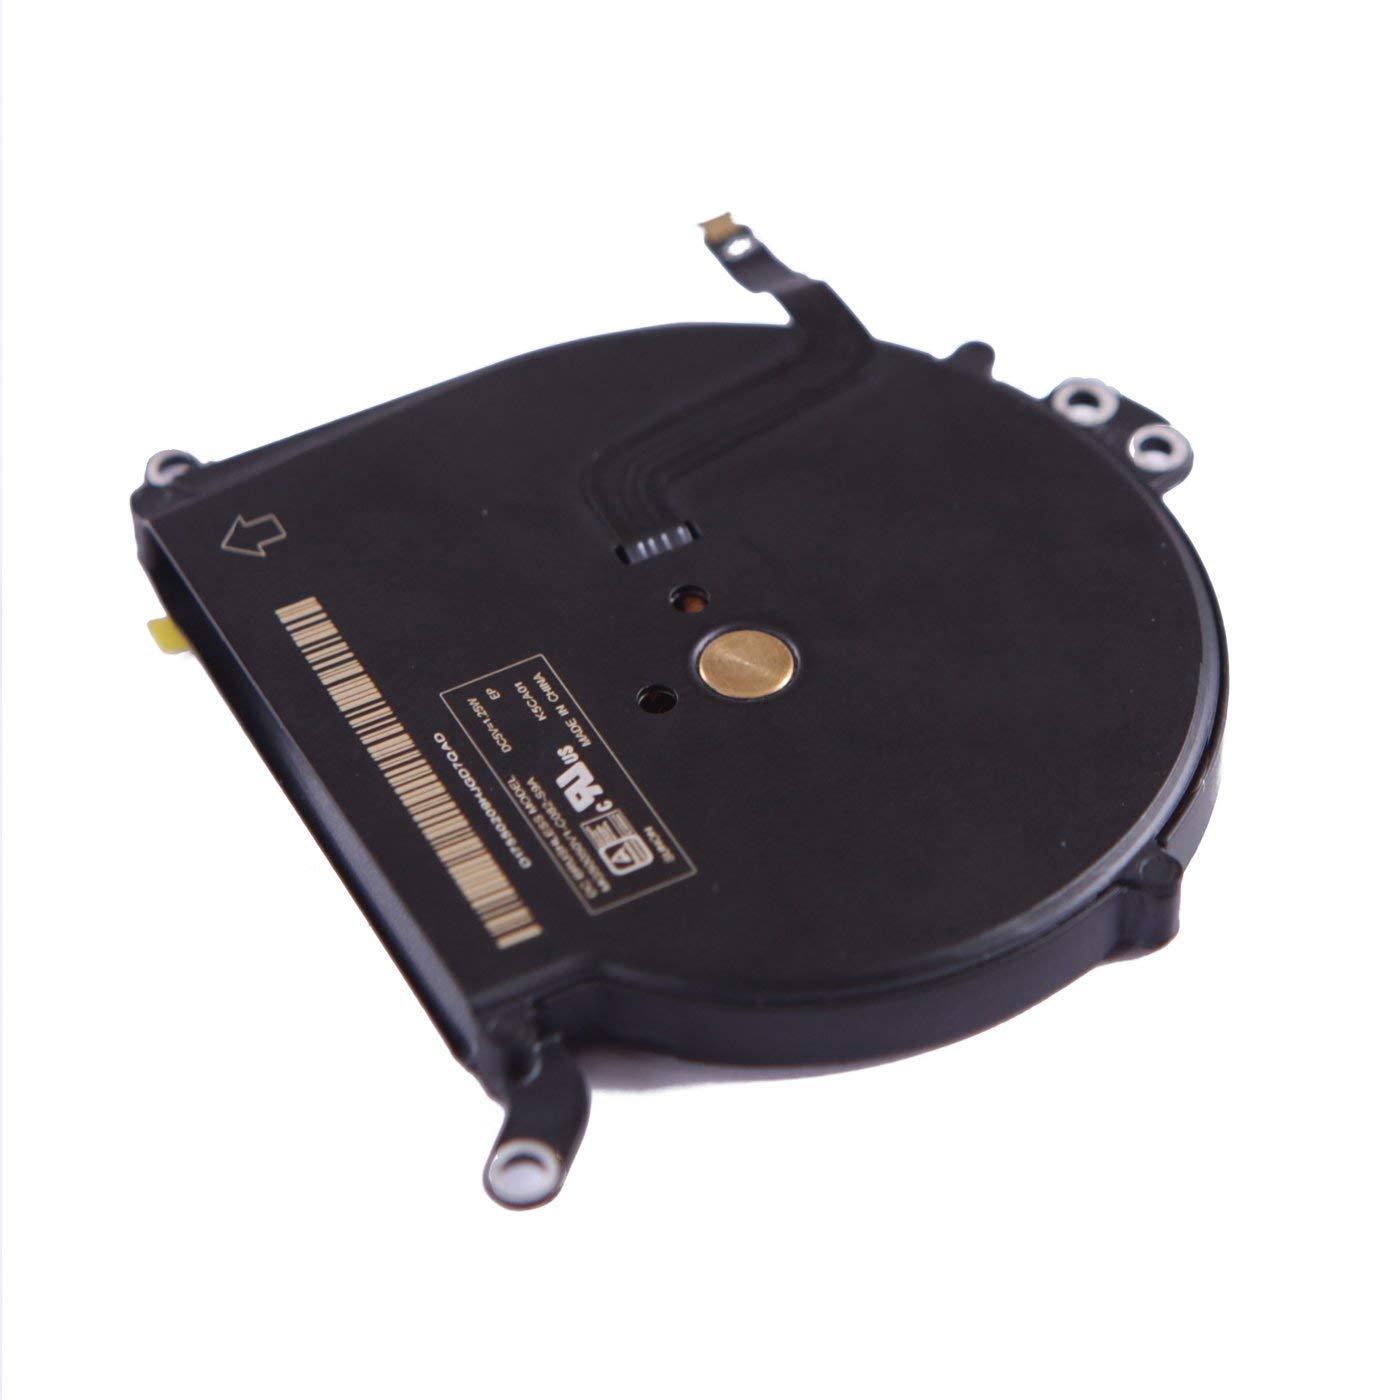 Cooler para MacBook Air 13 A1369 (2010,2011)  A1466 (2012  2013  2014  2015 2017)